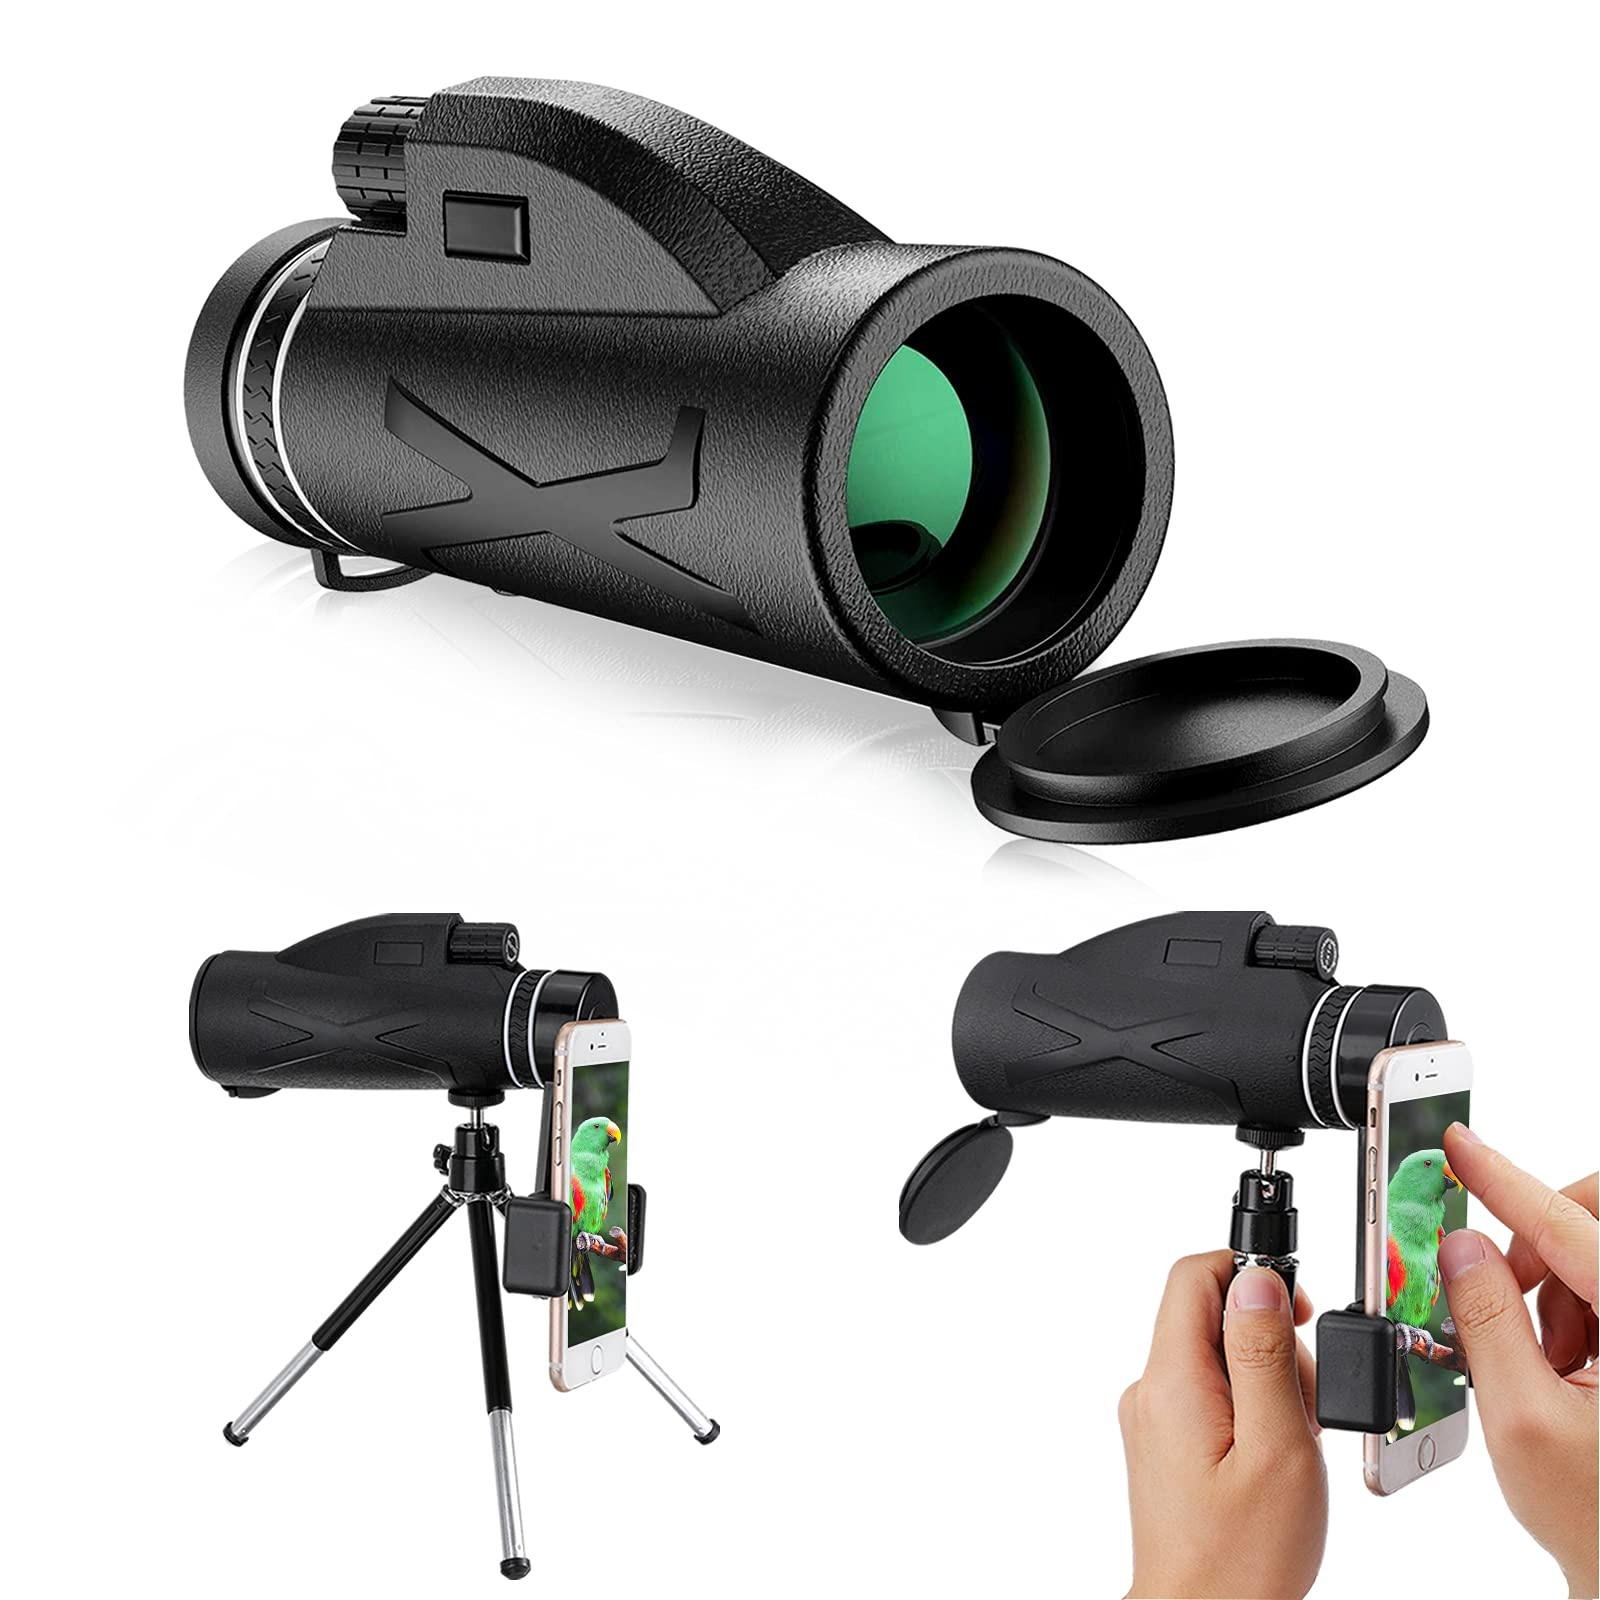 Monocular Telescope, 80x100 High Power Monocular with Smartphone Holder & Tripod, Waterproof Zoom Telescope,for Bird Watching Hunting Camping Travelling Wildlife Secenery